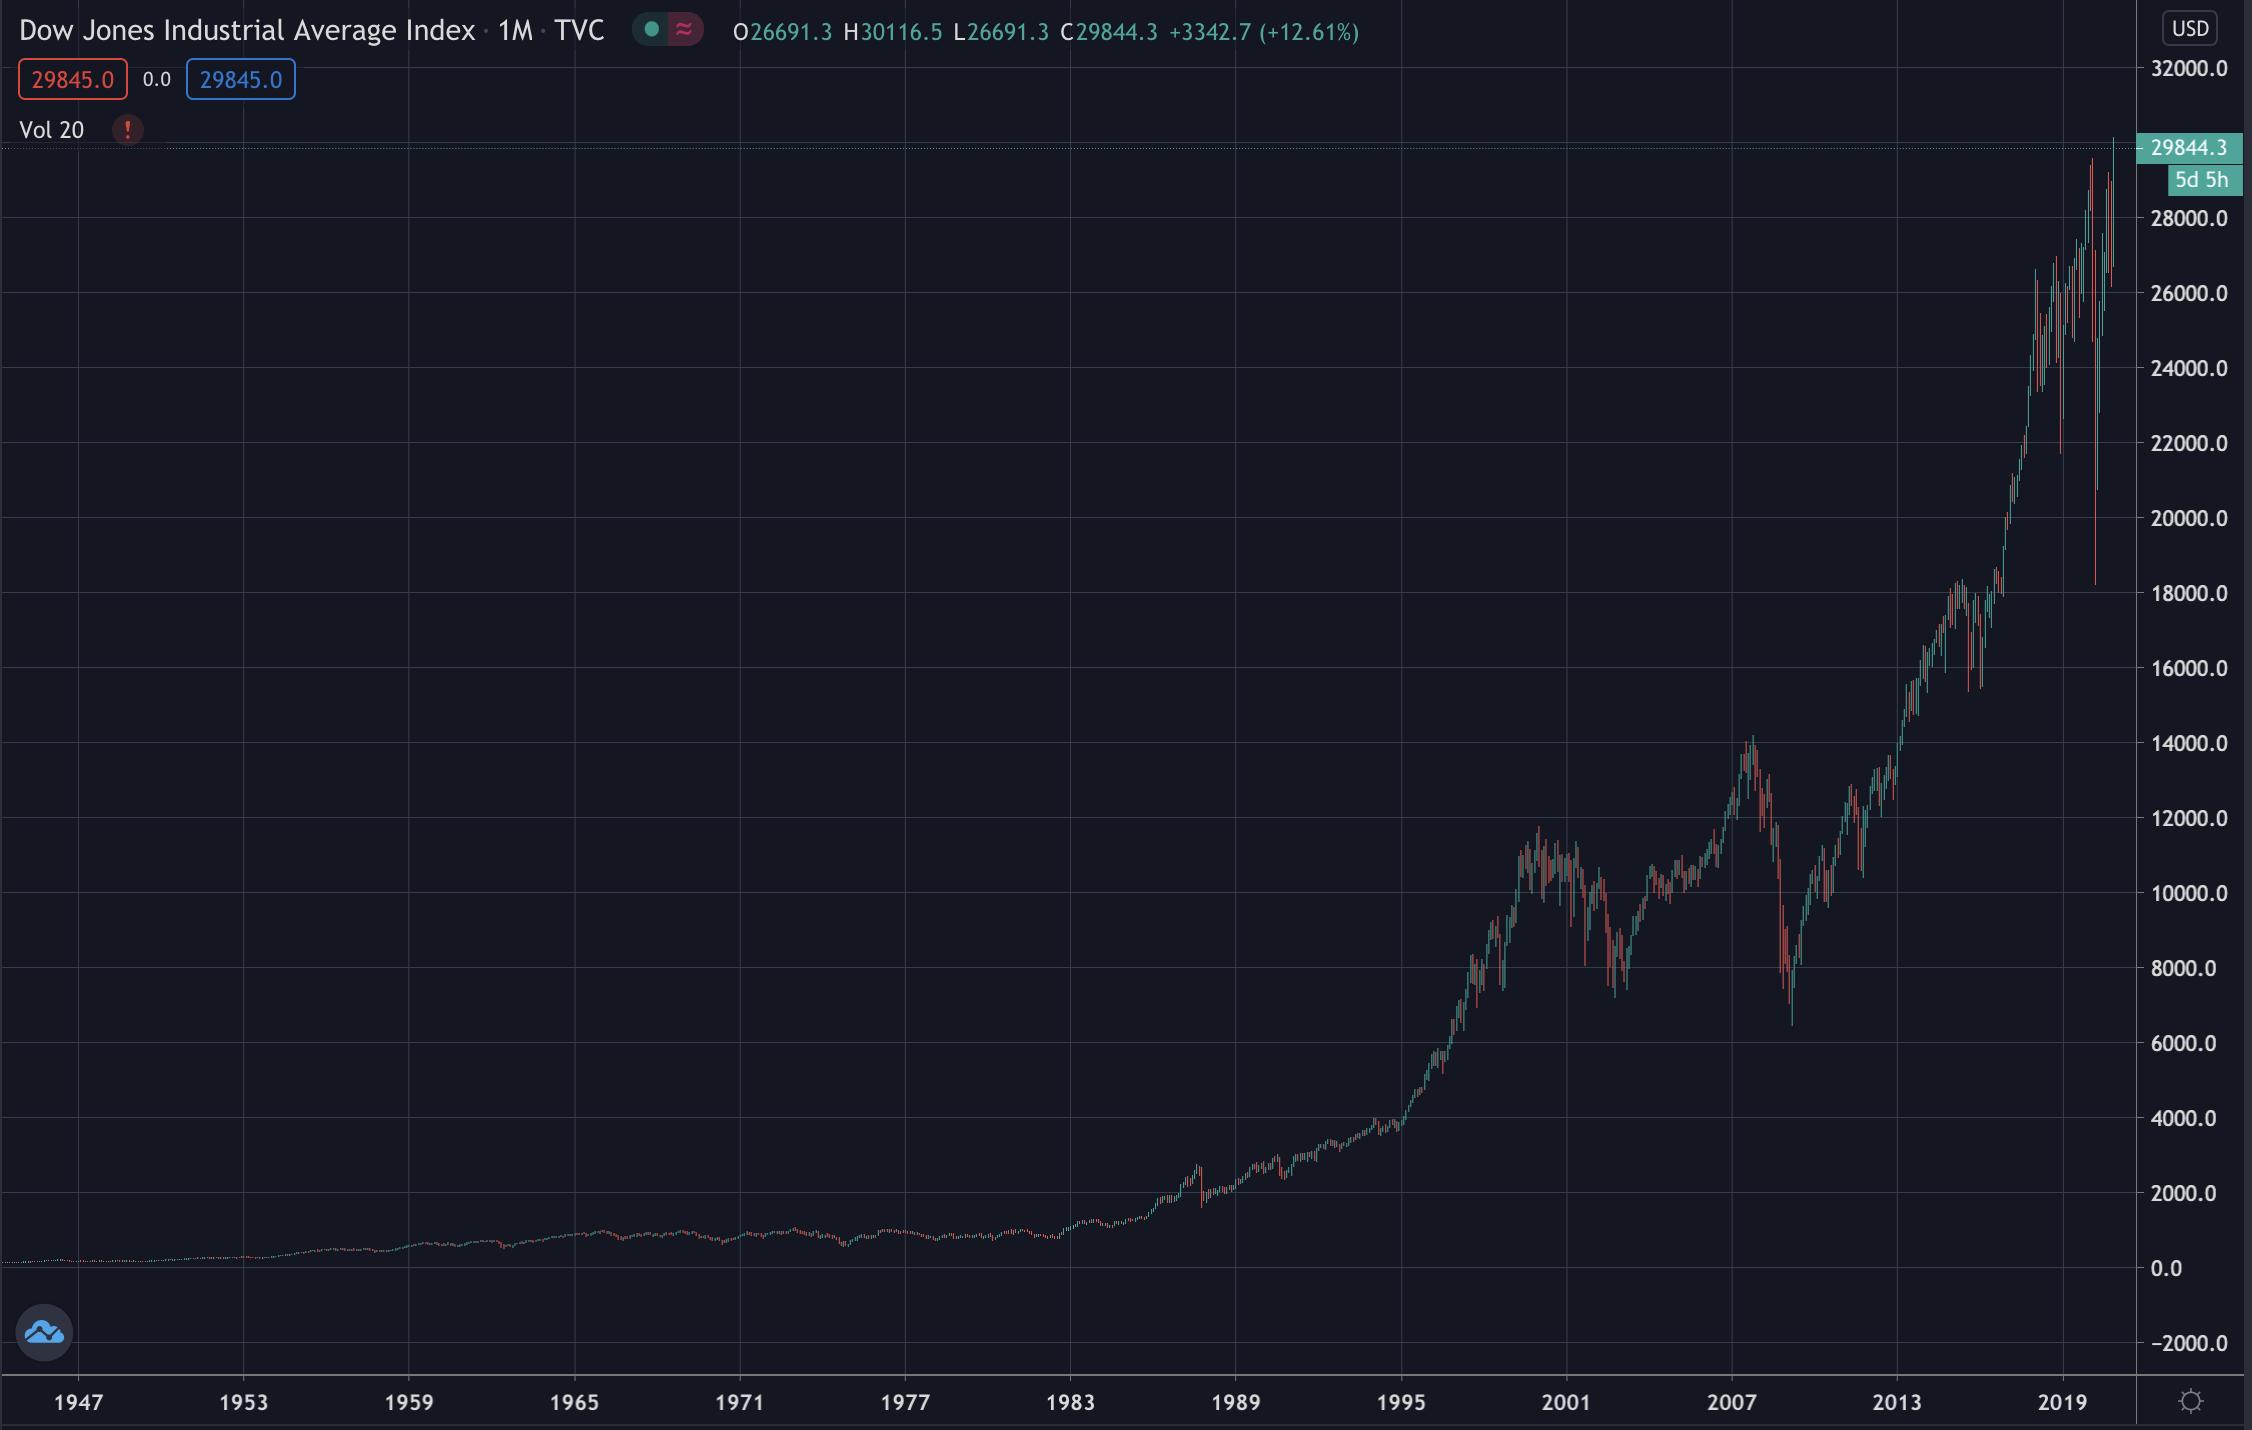 Dow Jones bull run continues, Nov 2020